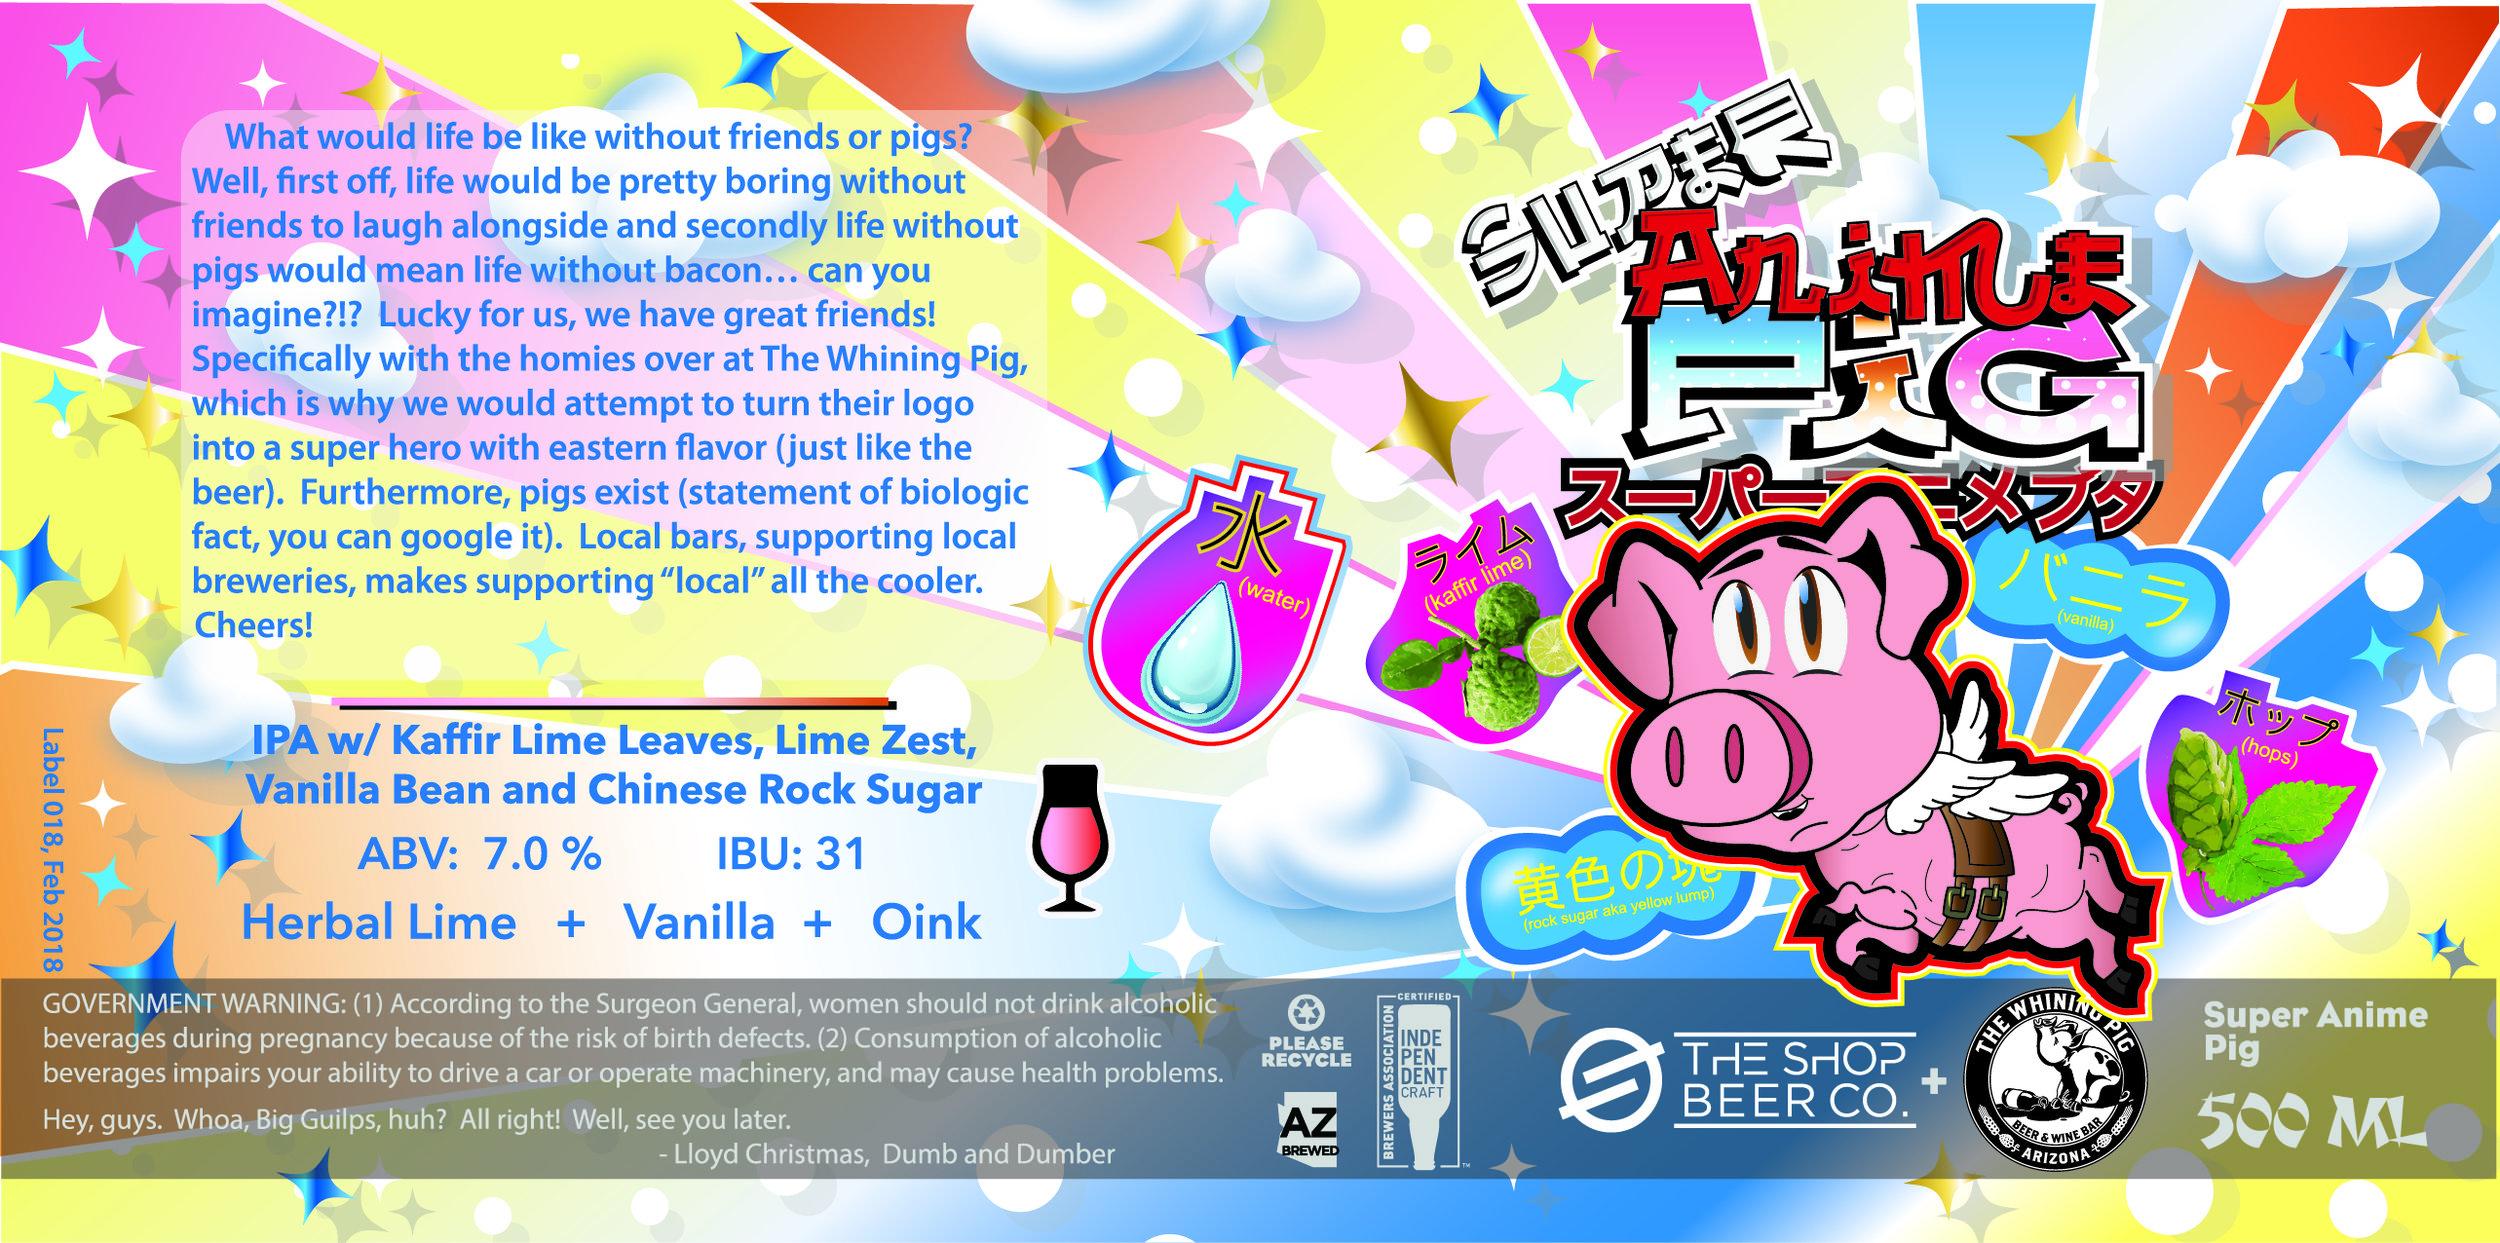 TheShopBeerCo_500ml_Super Anime Pig_Print_2-2-18 x 2-01.jpg